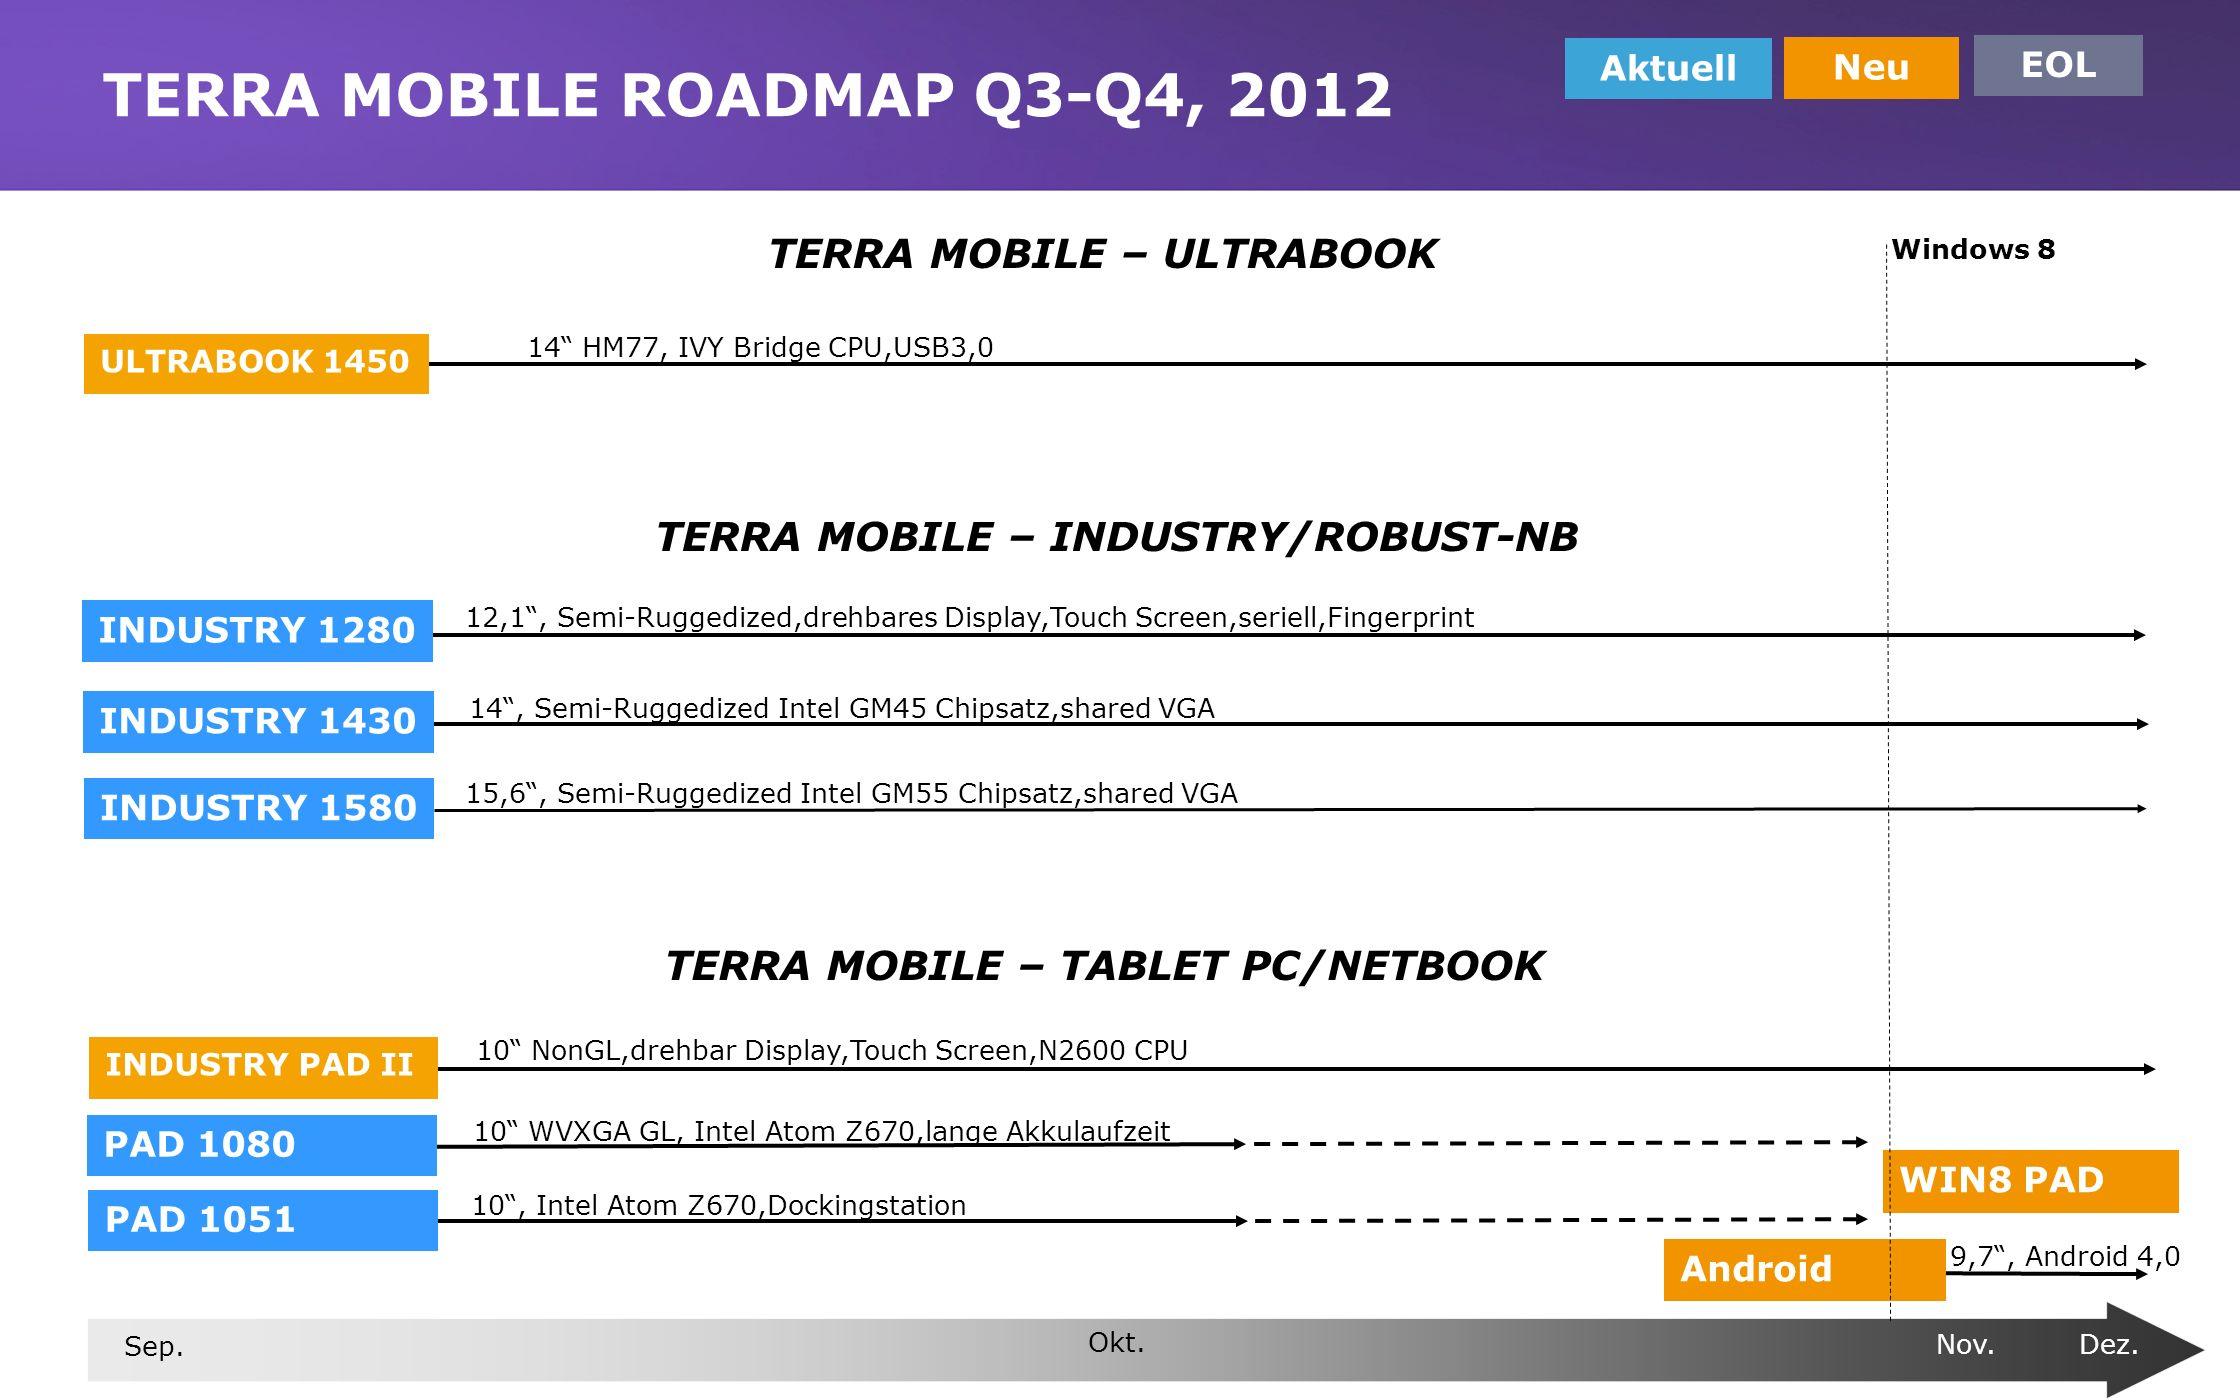 www.wortmann.de TERRA MOBILE ROADMAP Q3-Q4, 2012 Aktuell Neu EOL Sep. Okt. Nov. Dez. 10, Intel Atom Z670,Dockingstation 10 WVXGA GL, Intel Atom Z670,l